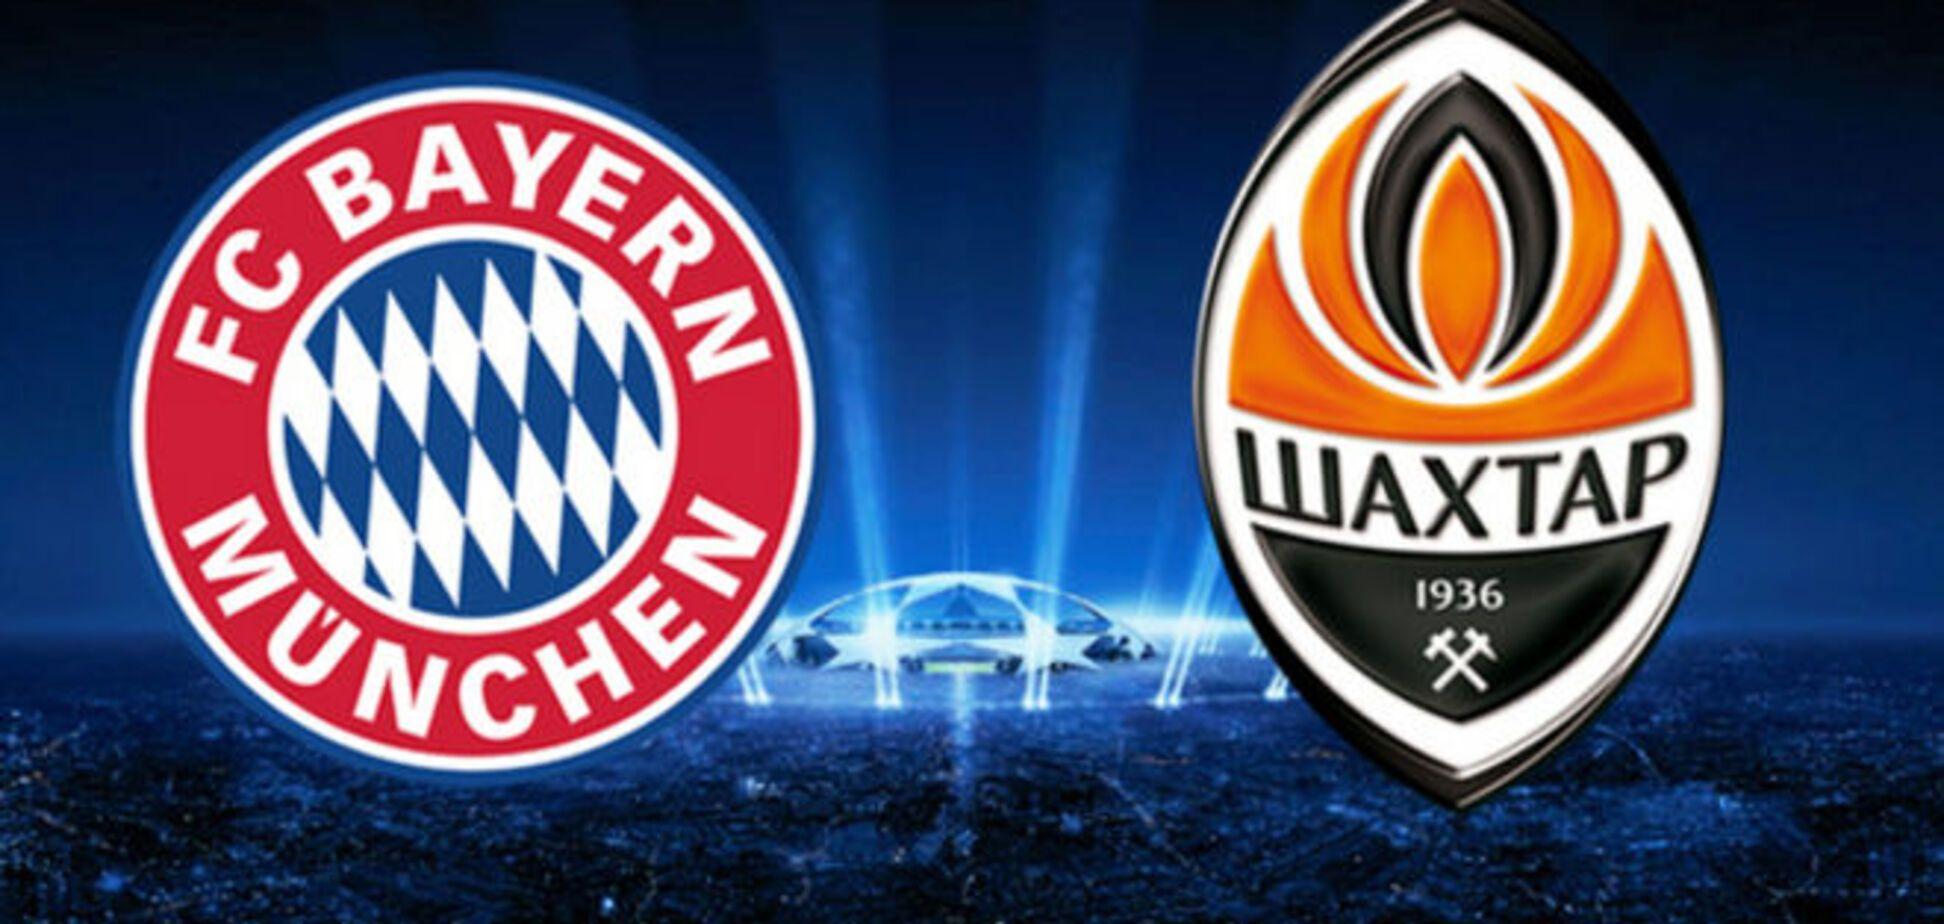 Лига чемпионов: Бавария - Шахтер - 7-0: хронология матча и видео голов